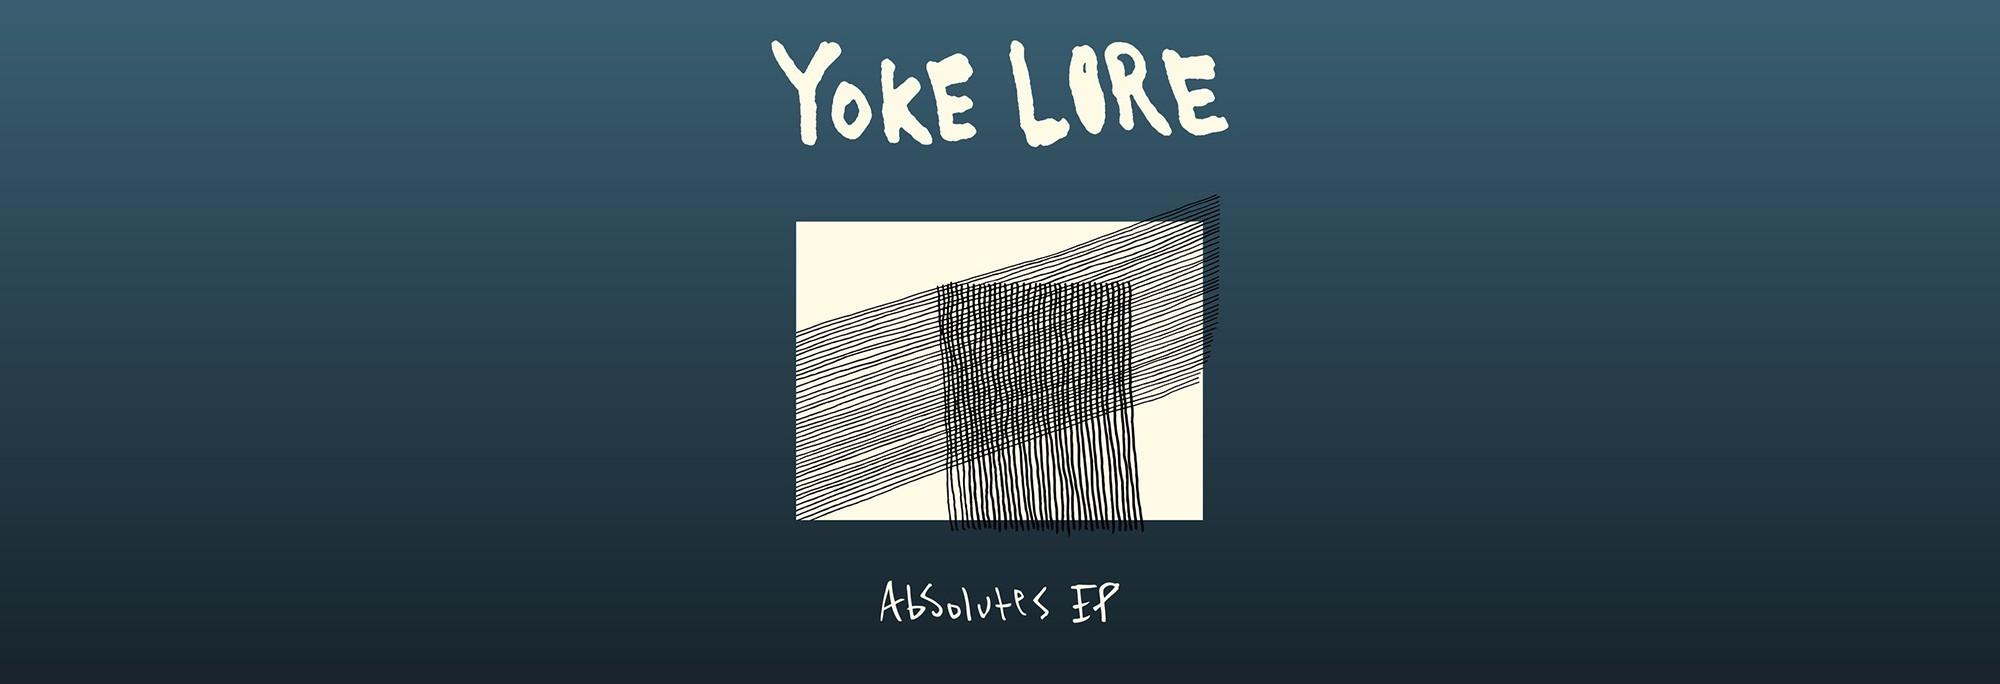 Yoke Lore - Absolutes EP